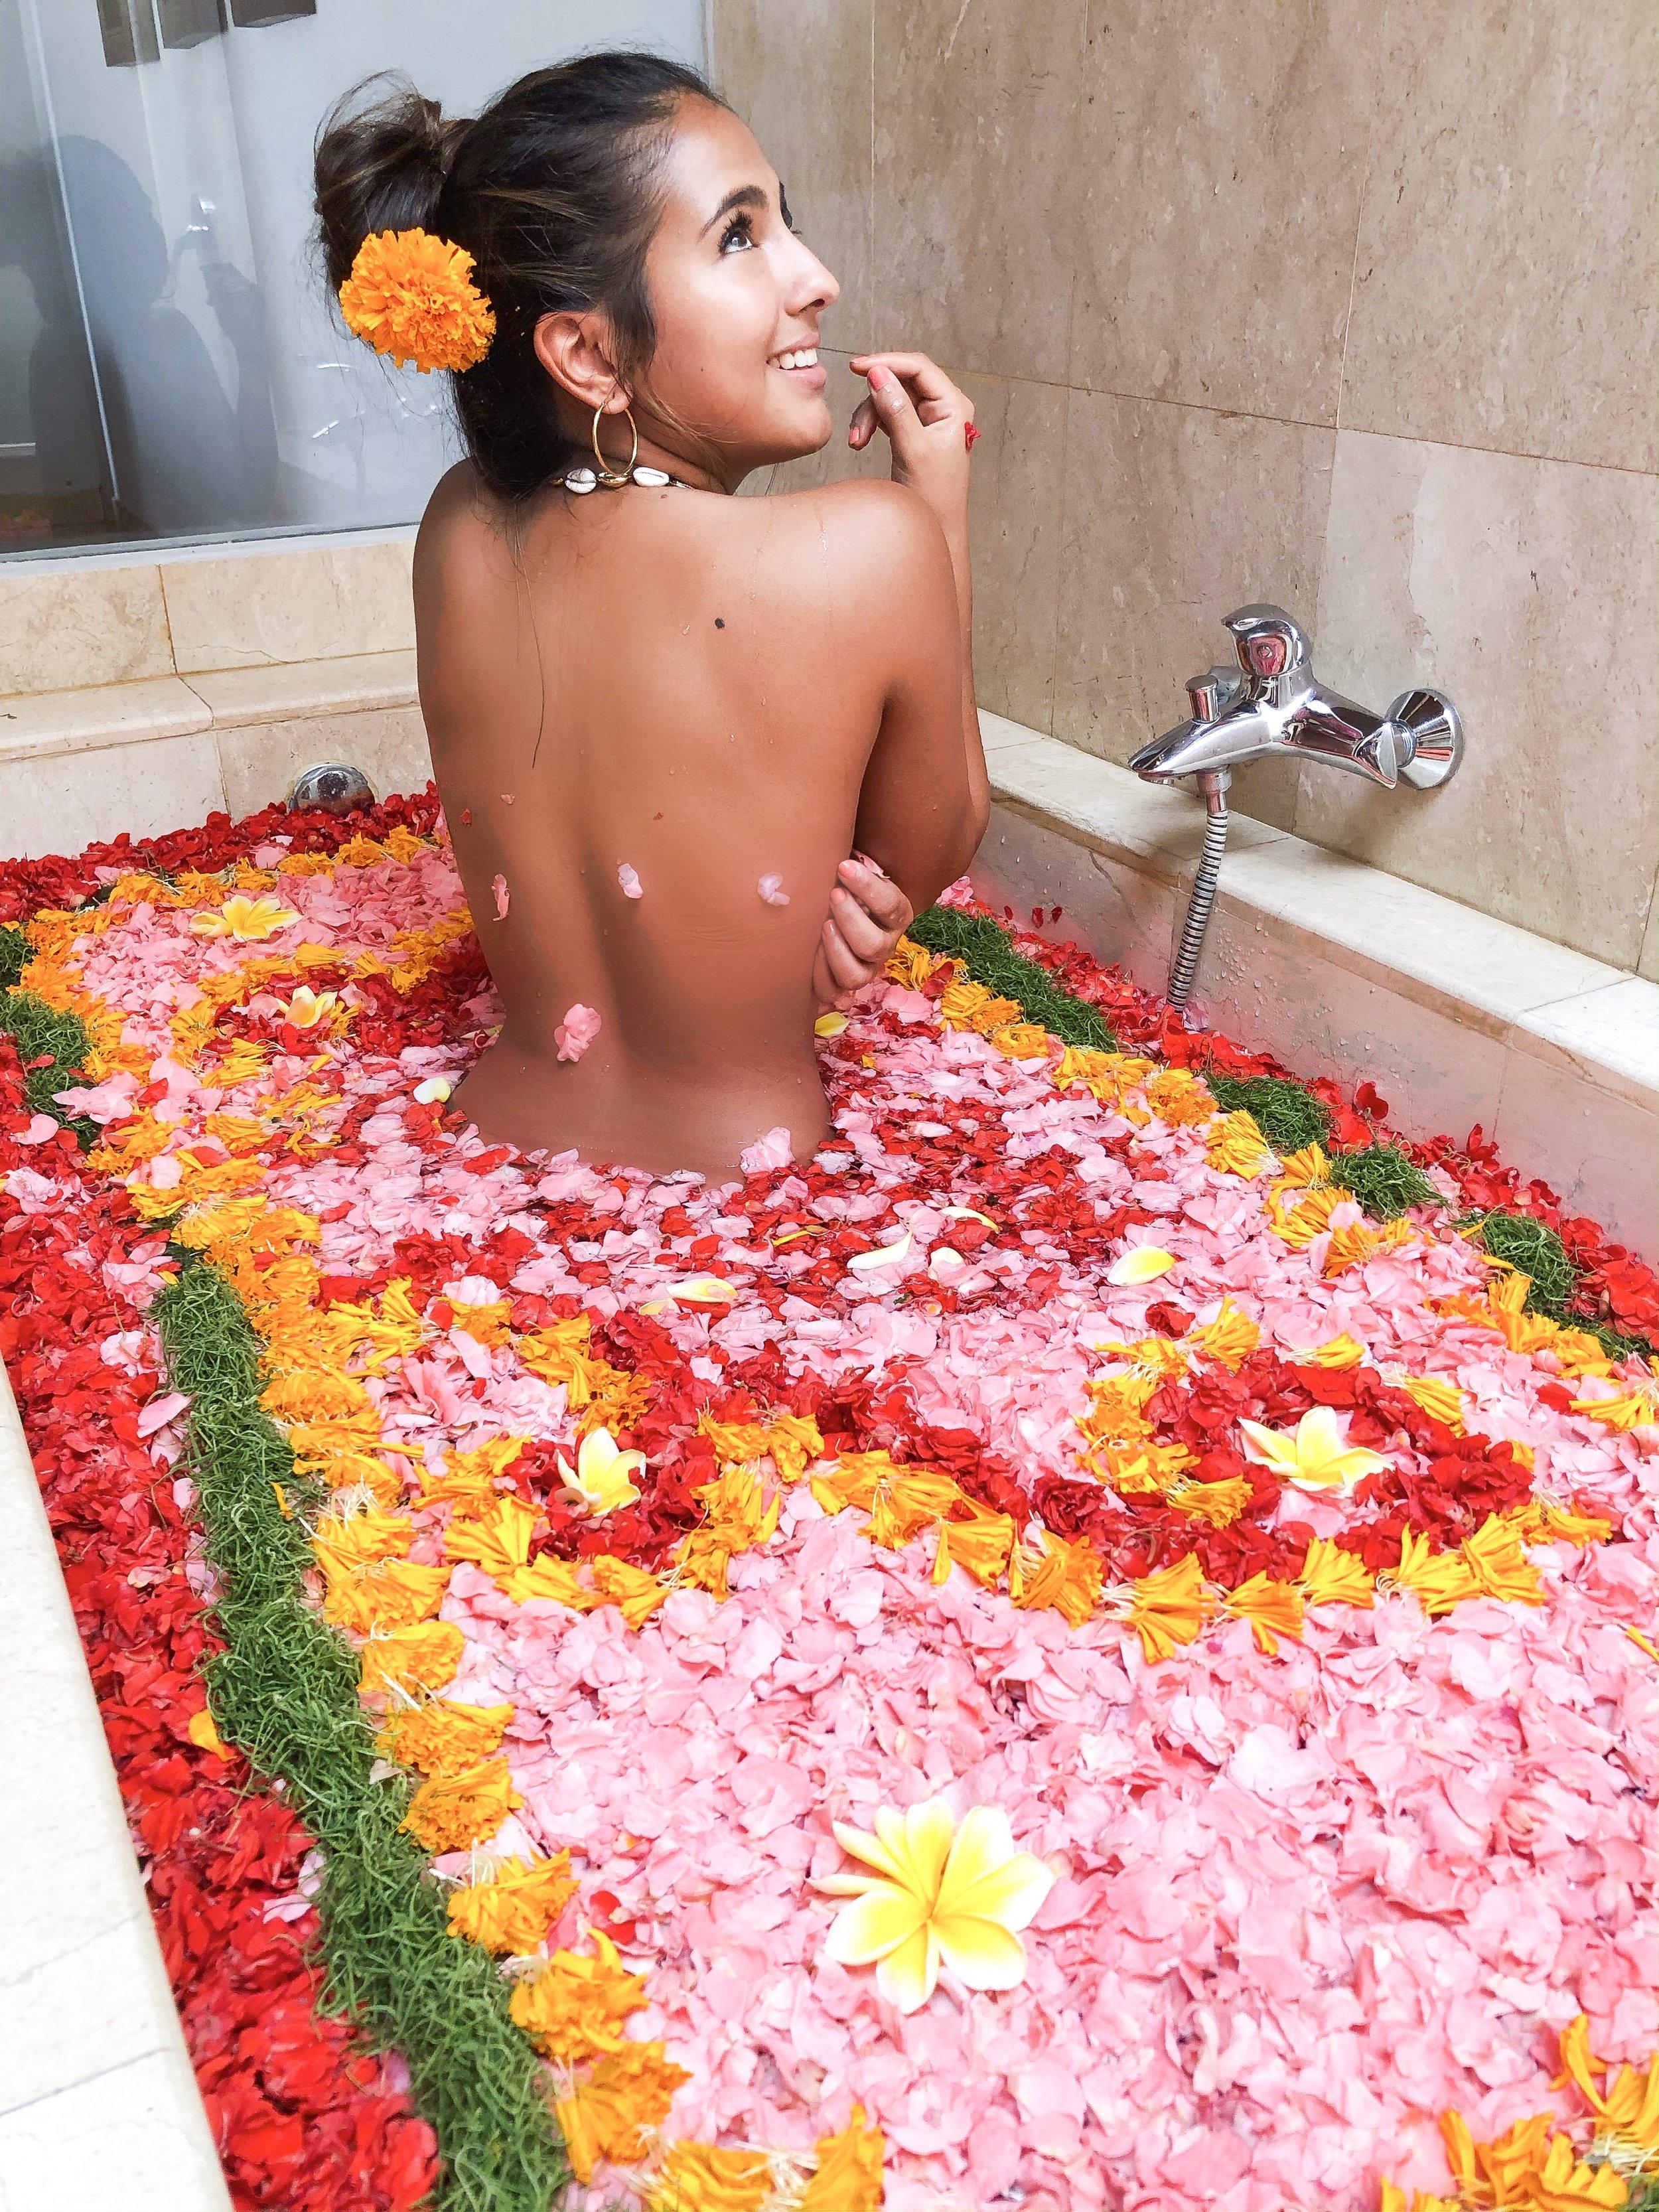 paloma de la cruz fashion travel blogger ideas palomatravels bali indonesia coolness world roses petals